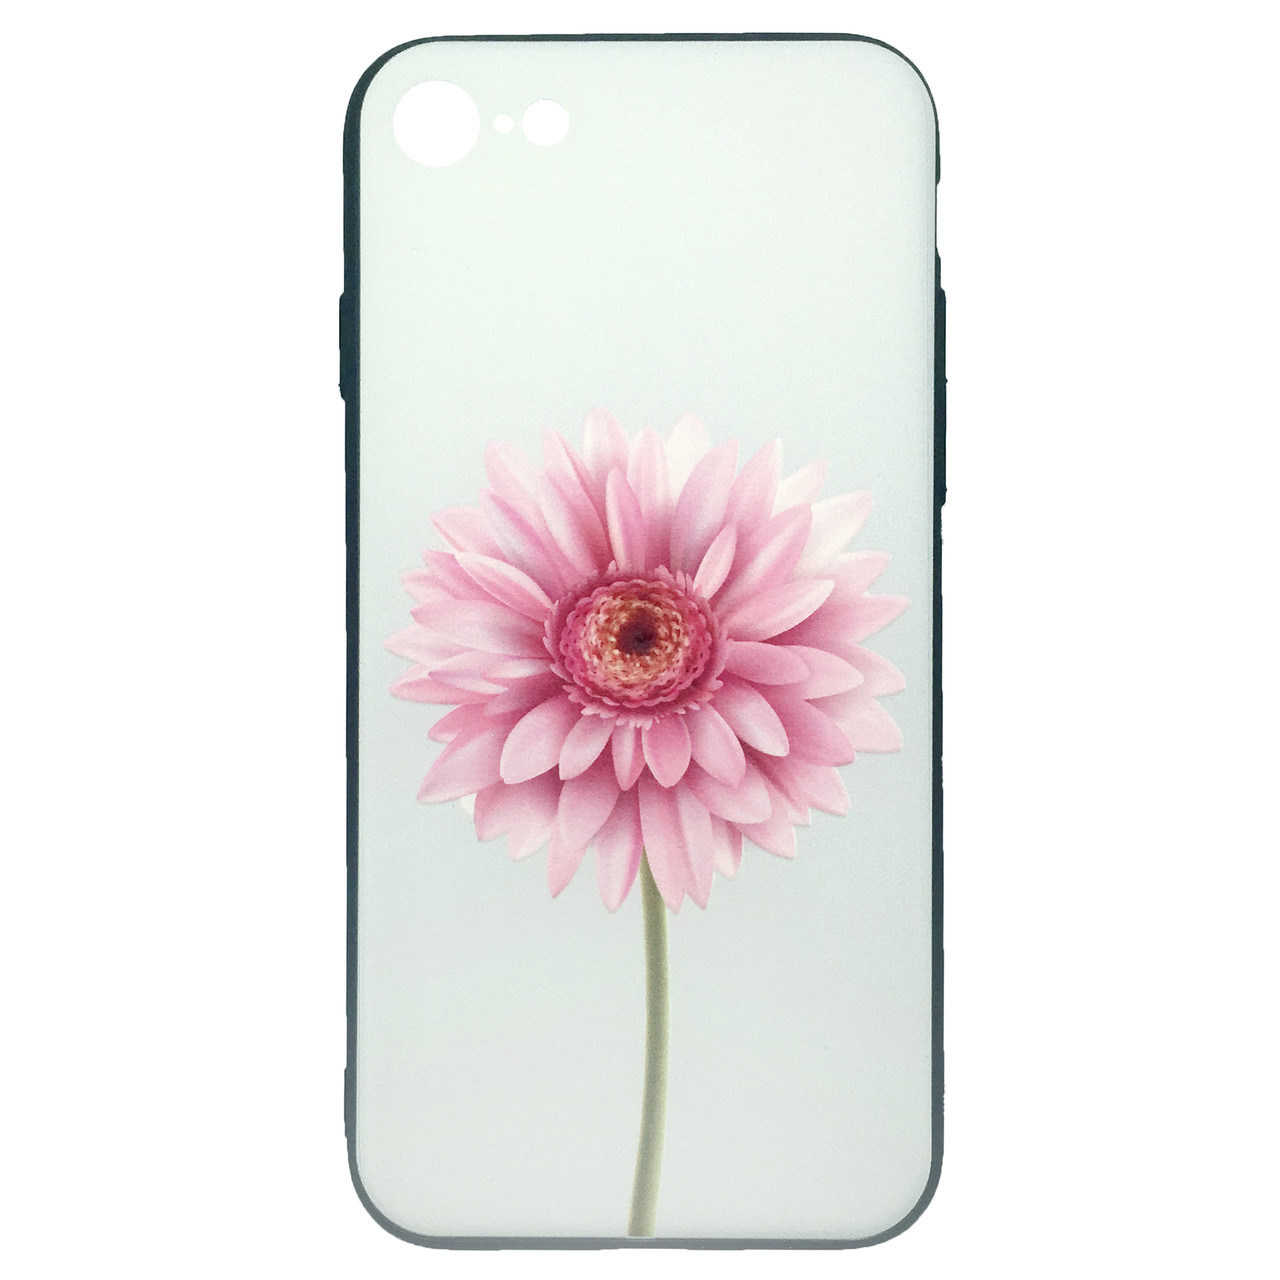 Чехол на iPhone 7 Plus/8 Plus Ромашка, плотный силикон